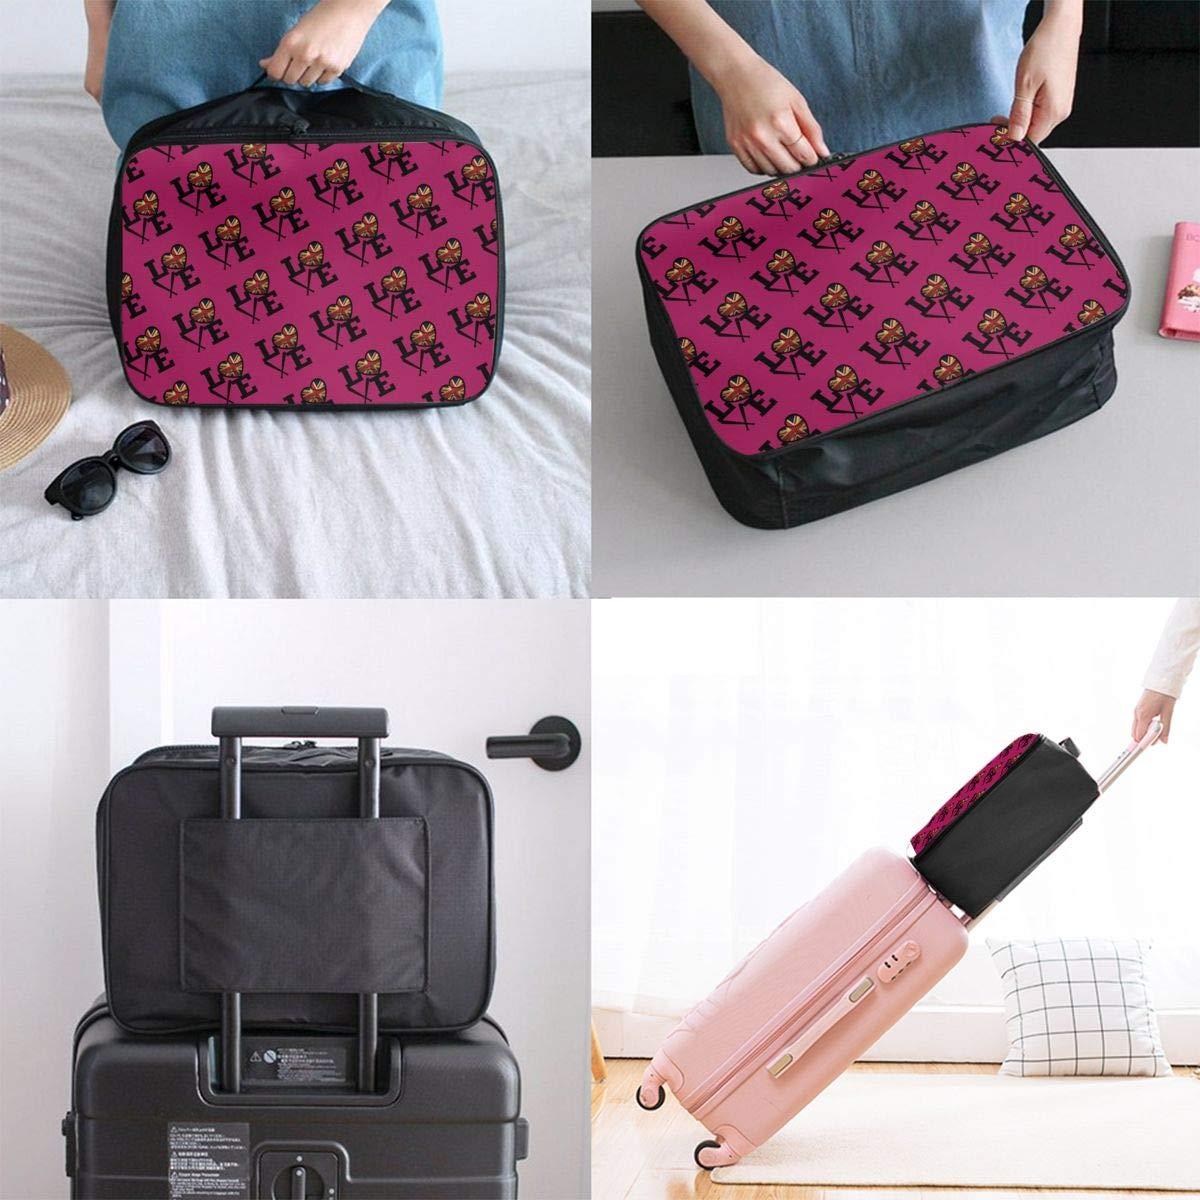 YueLJB Love UK British Flag Lightweight Large Capacity Portable Luggage Bag Travel Duffel Bag Storage Carry Luggage Duffle Tote Bag